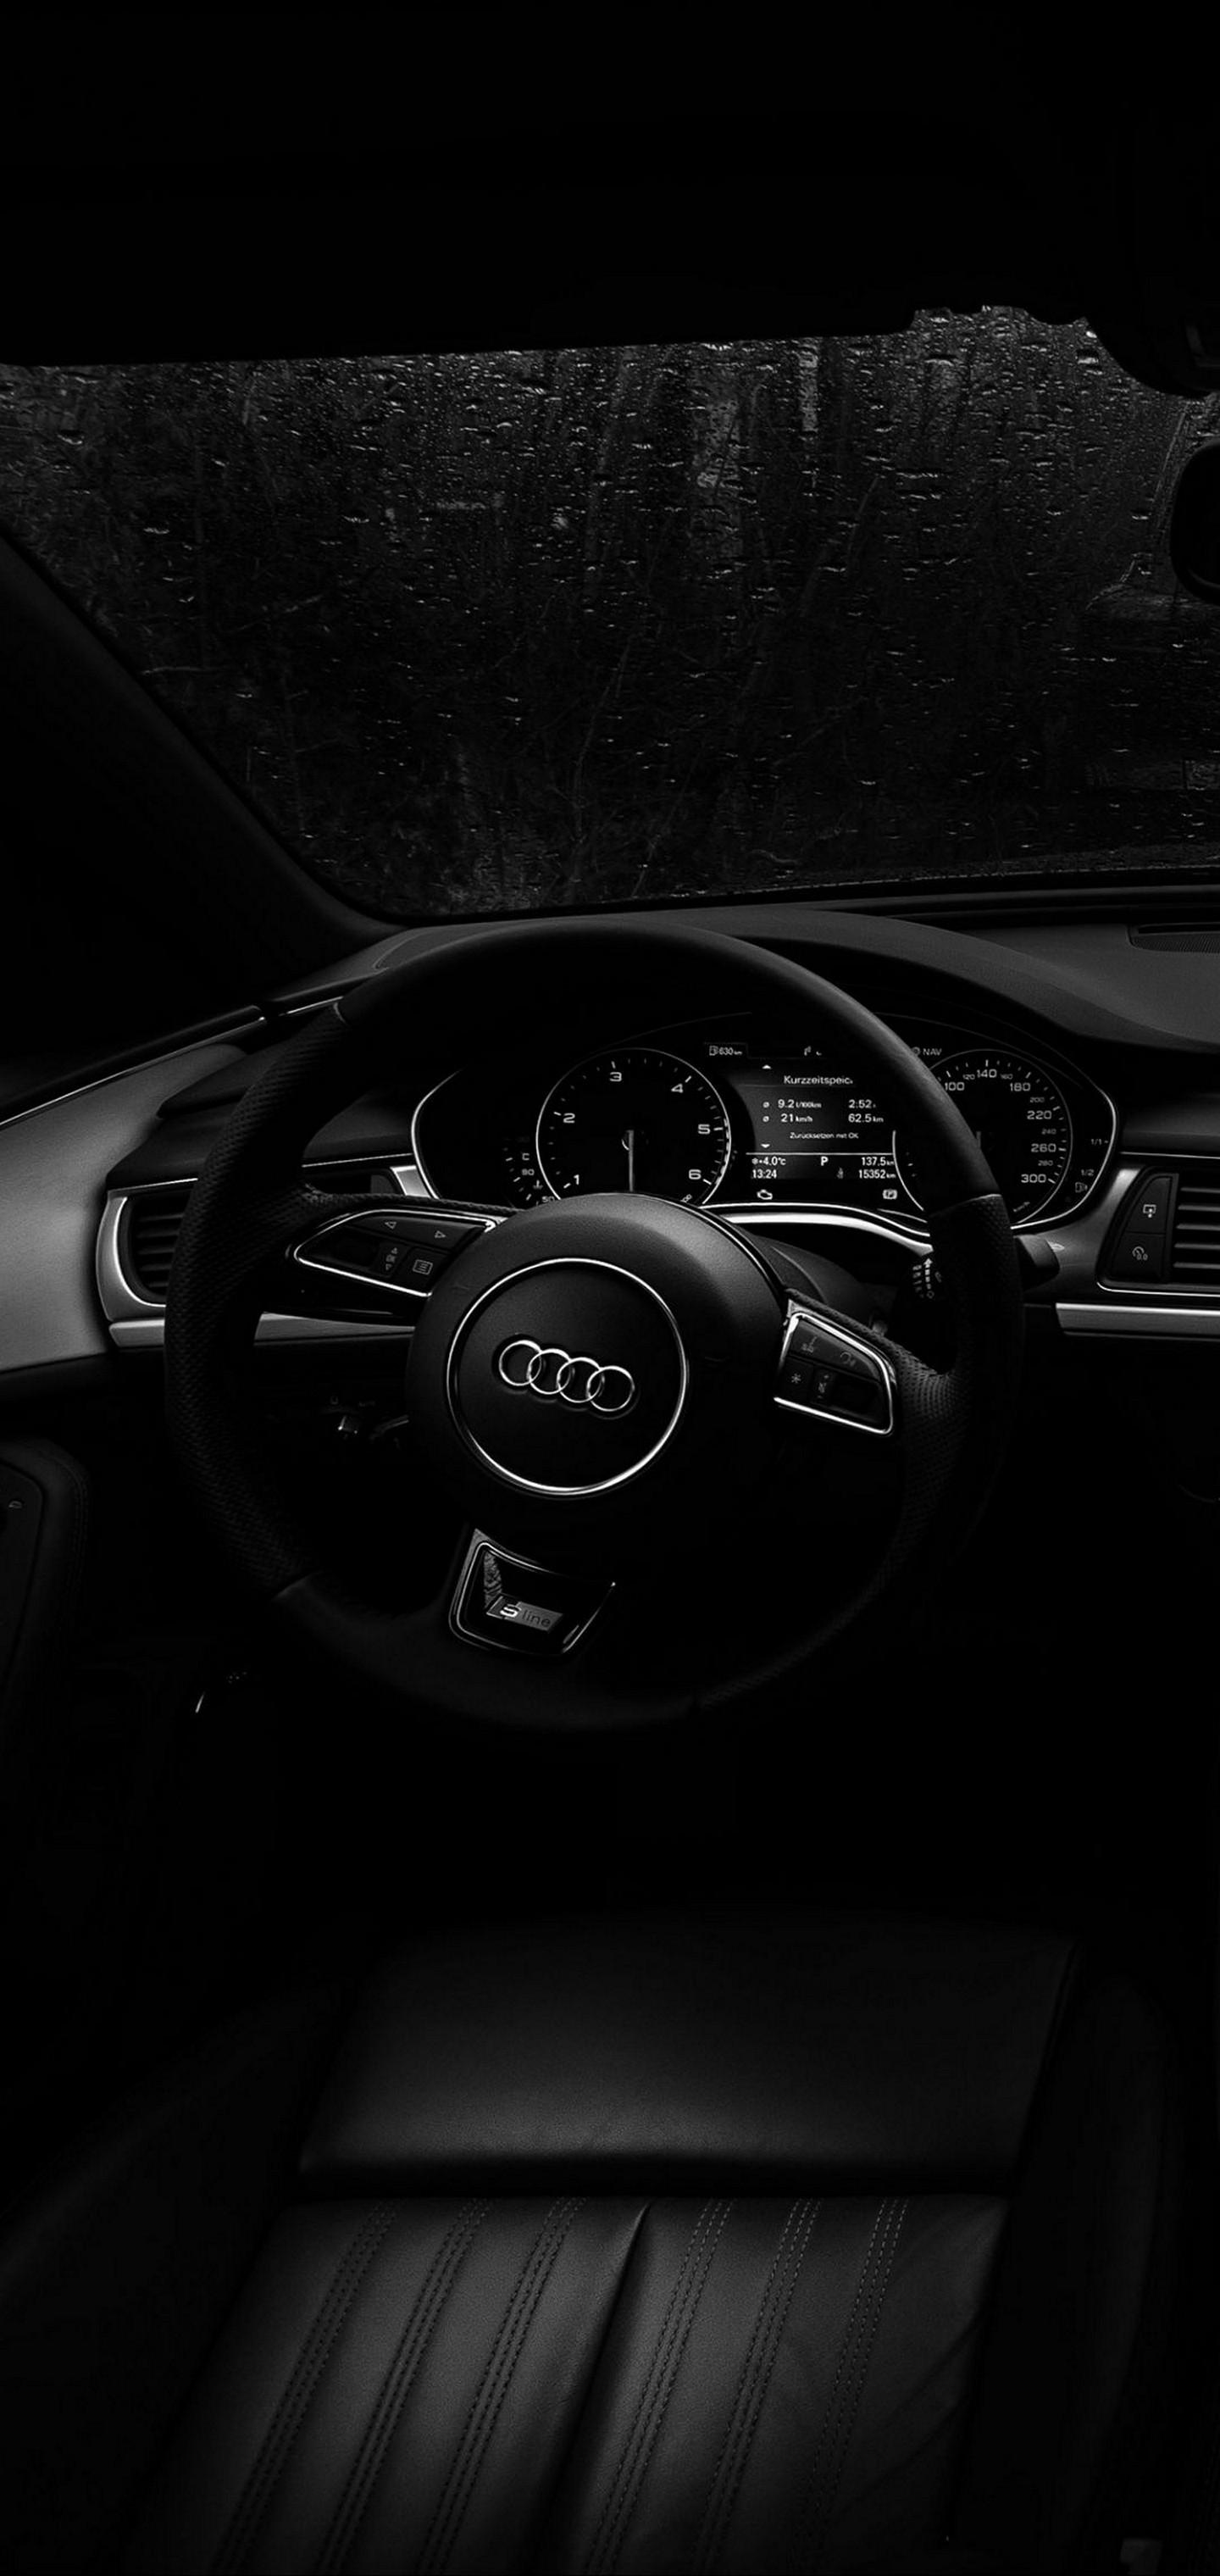 Audi Steering Wheel Wallpaper 1440x3040